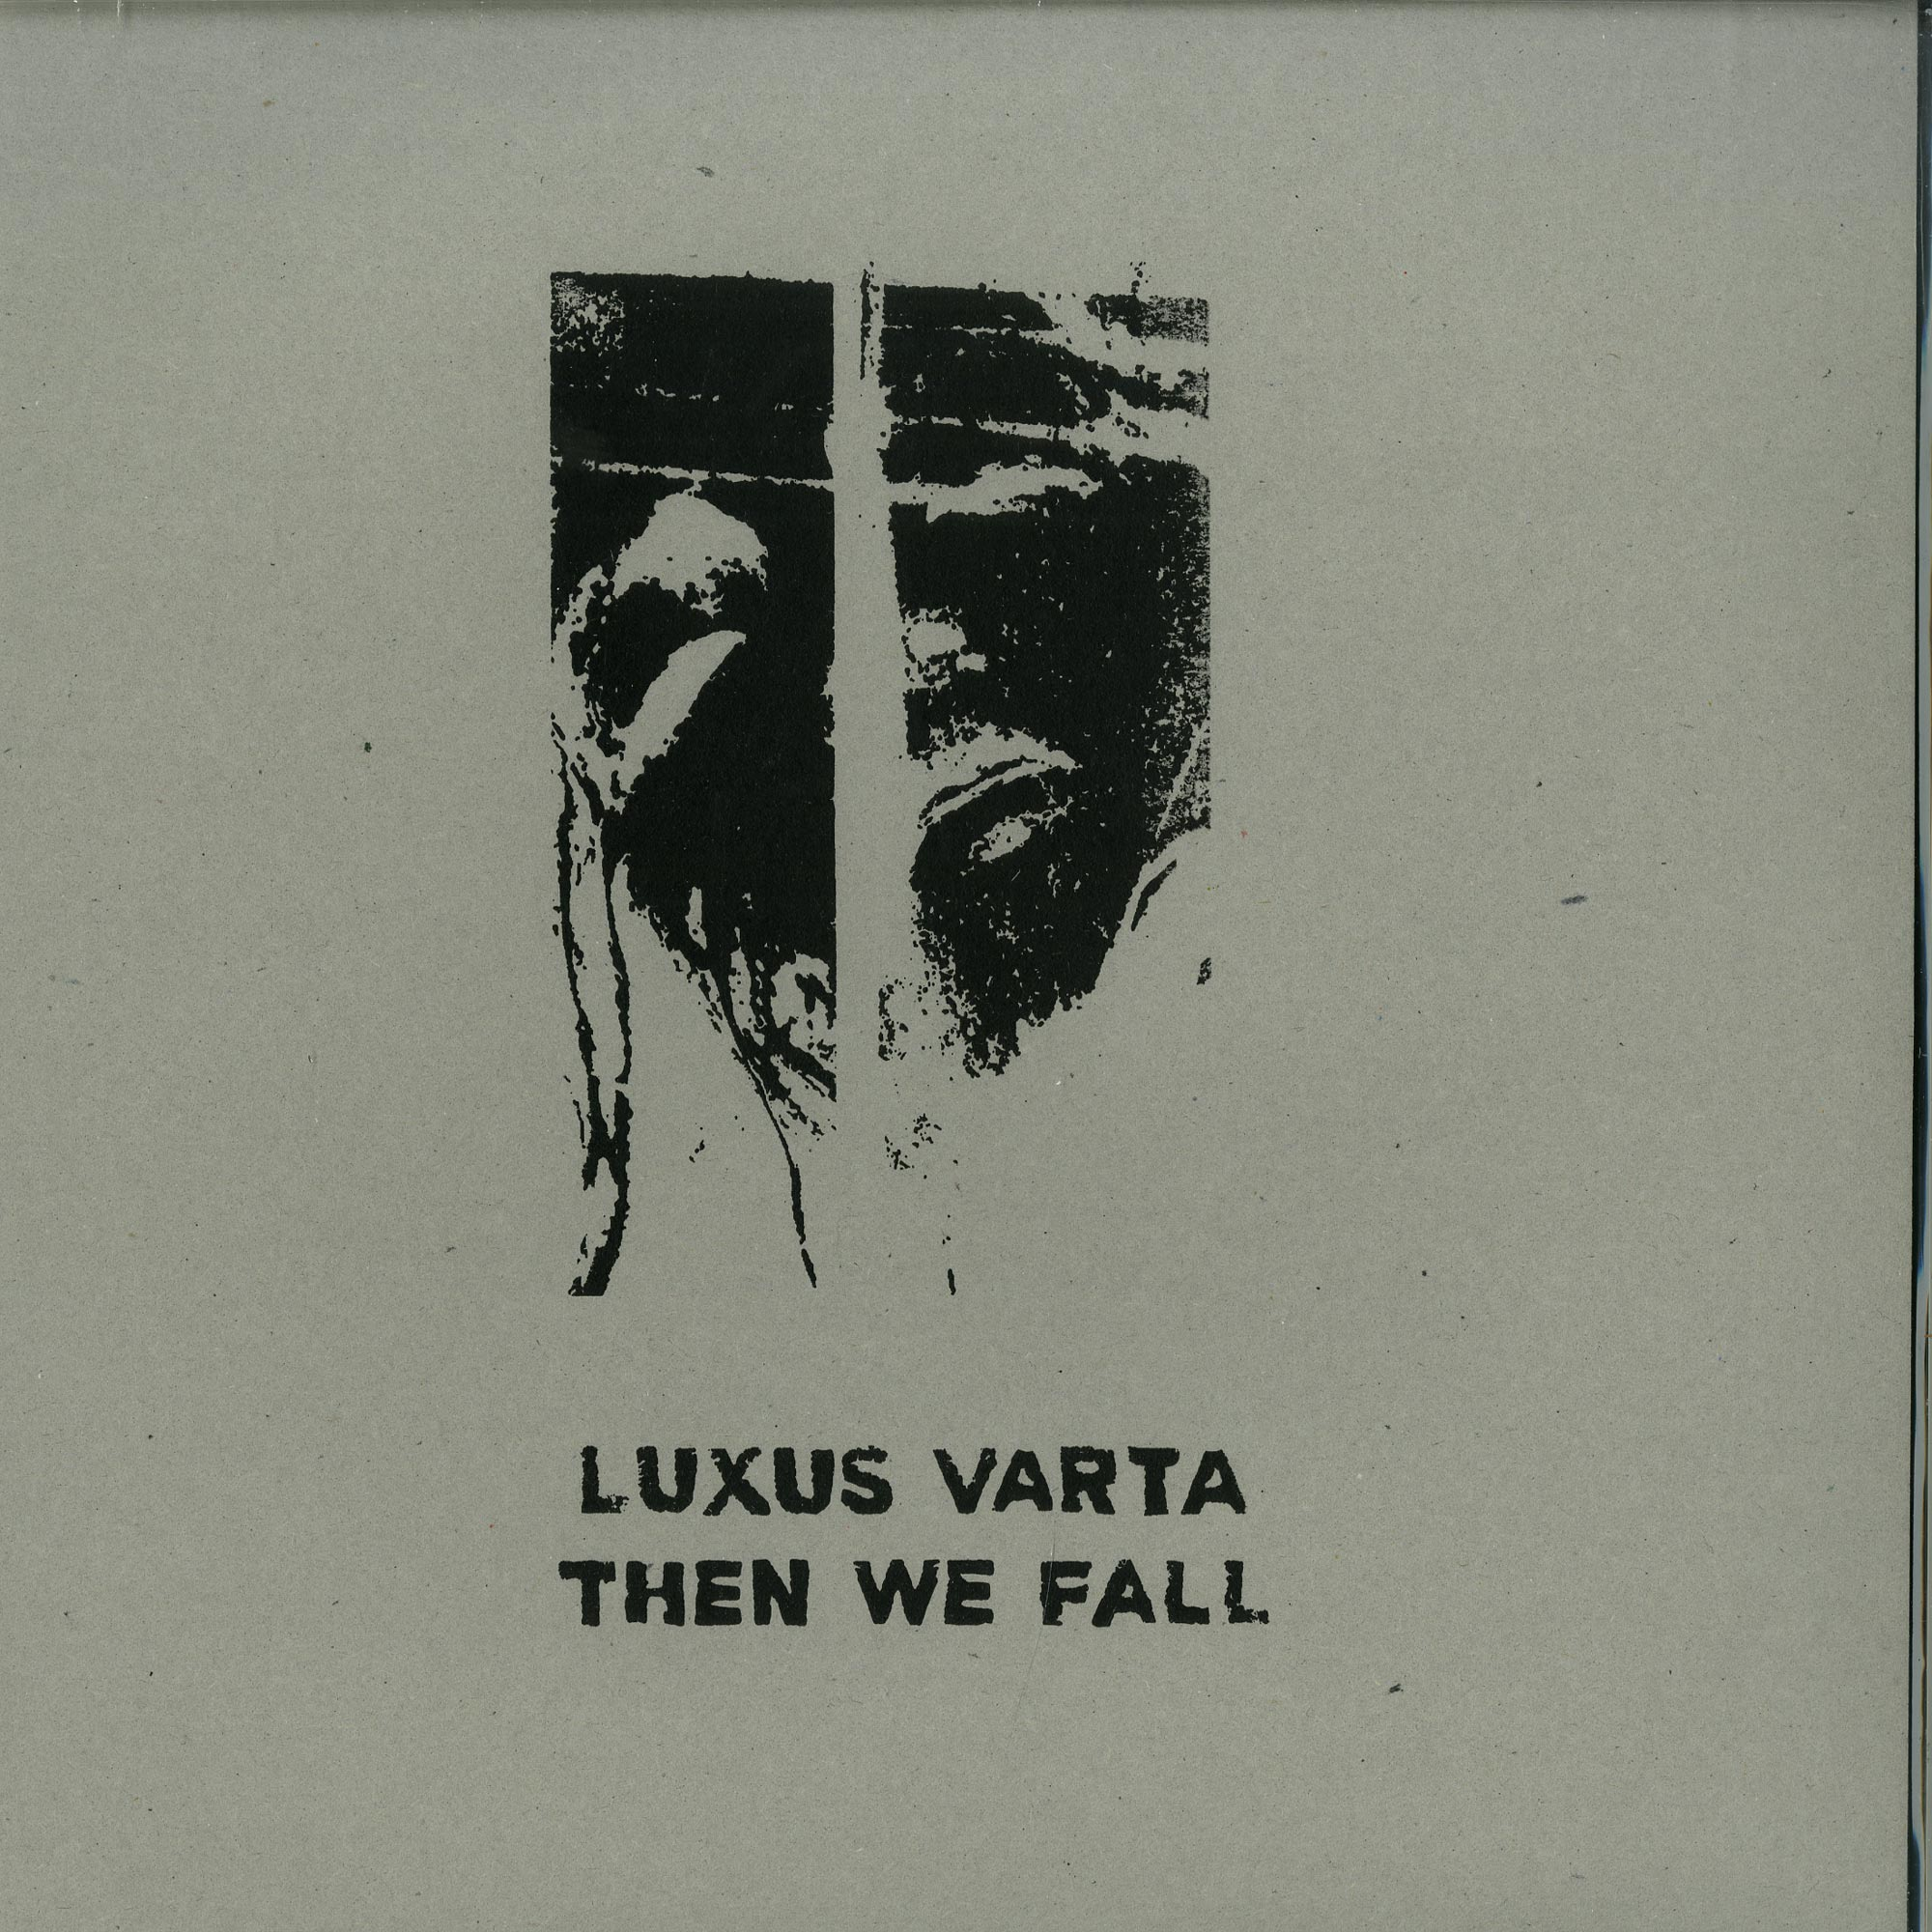 Luxus Varta - THEN WE FALL